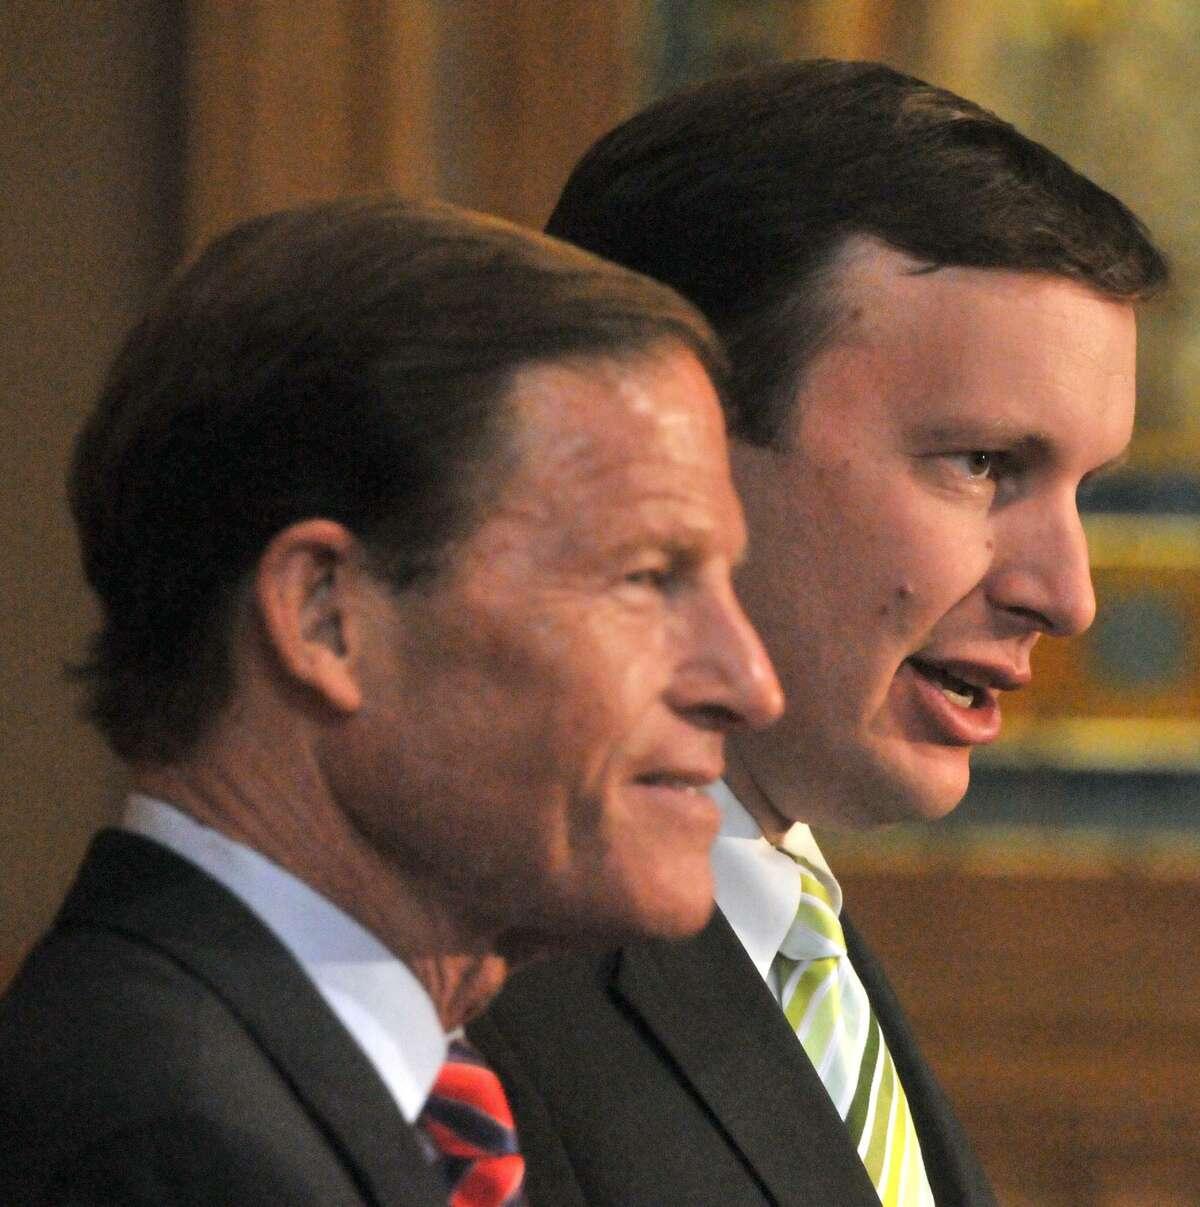 U.S. Senators Richard Blumenthal, left, and Chris Murphy